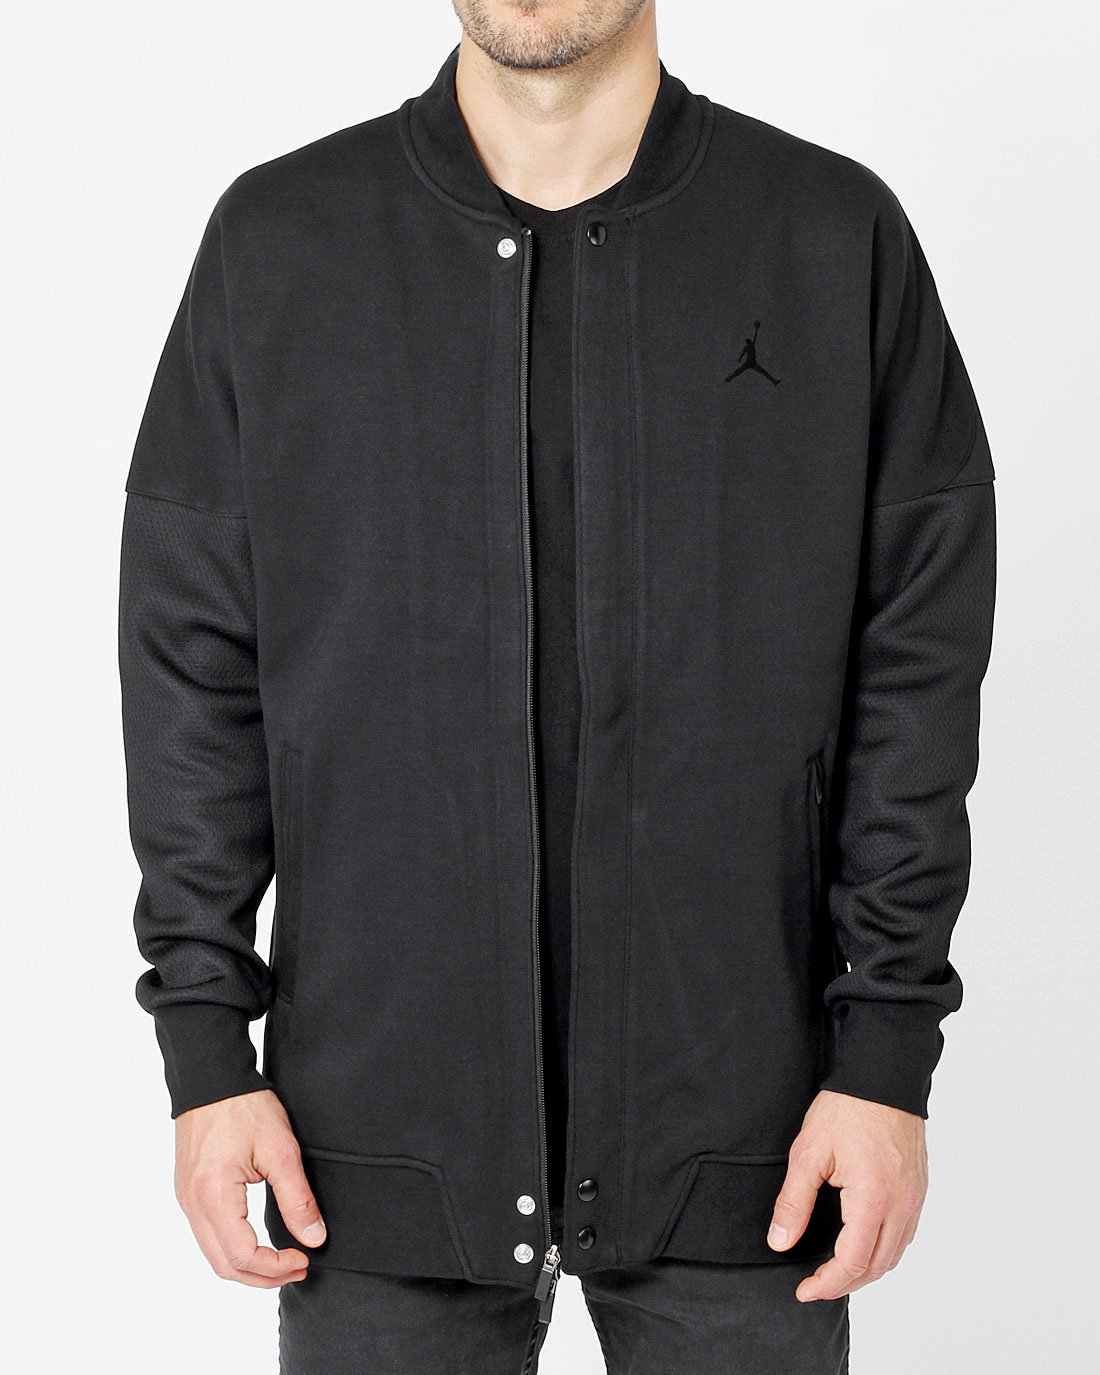 Jordan Black/Black Air Jordan The Varsity Jacket by Jordan